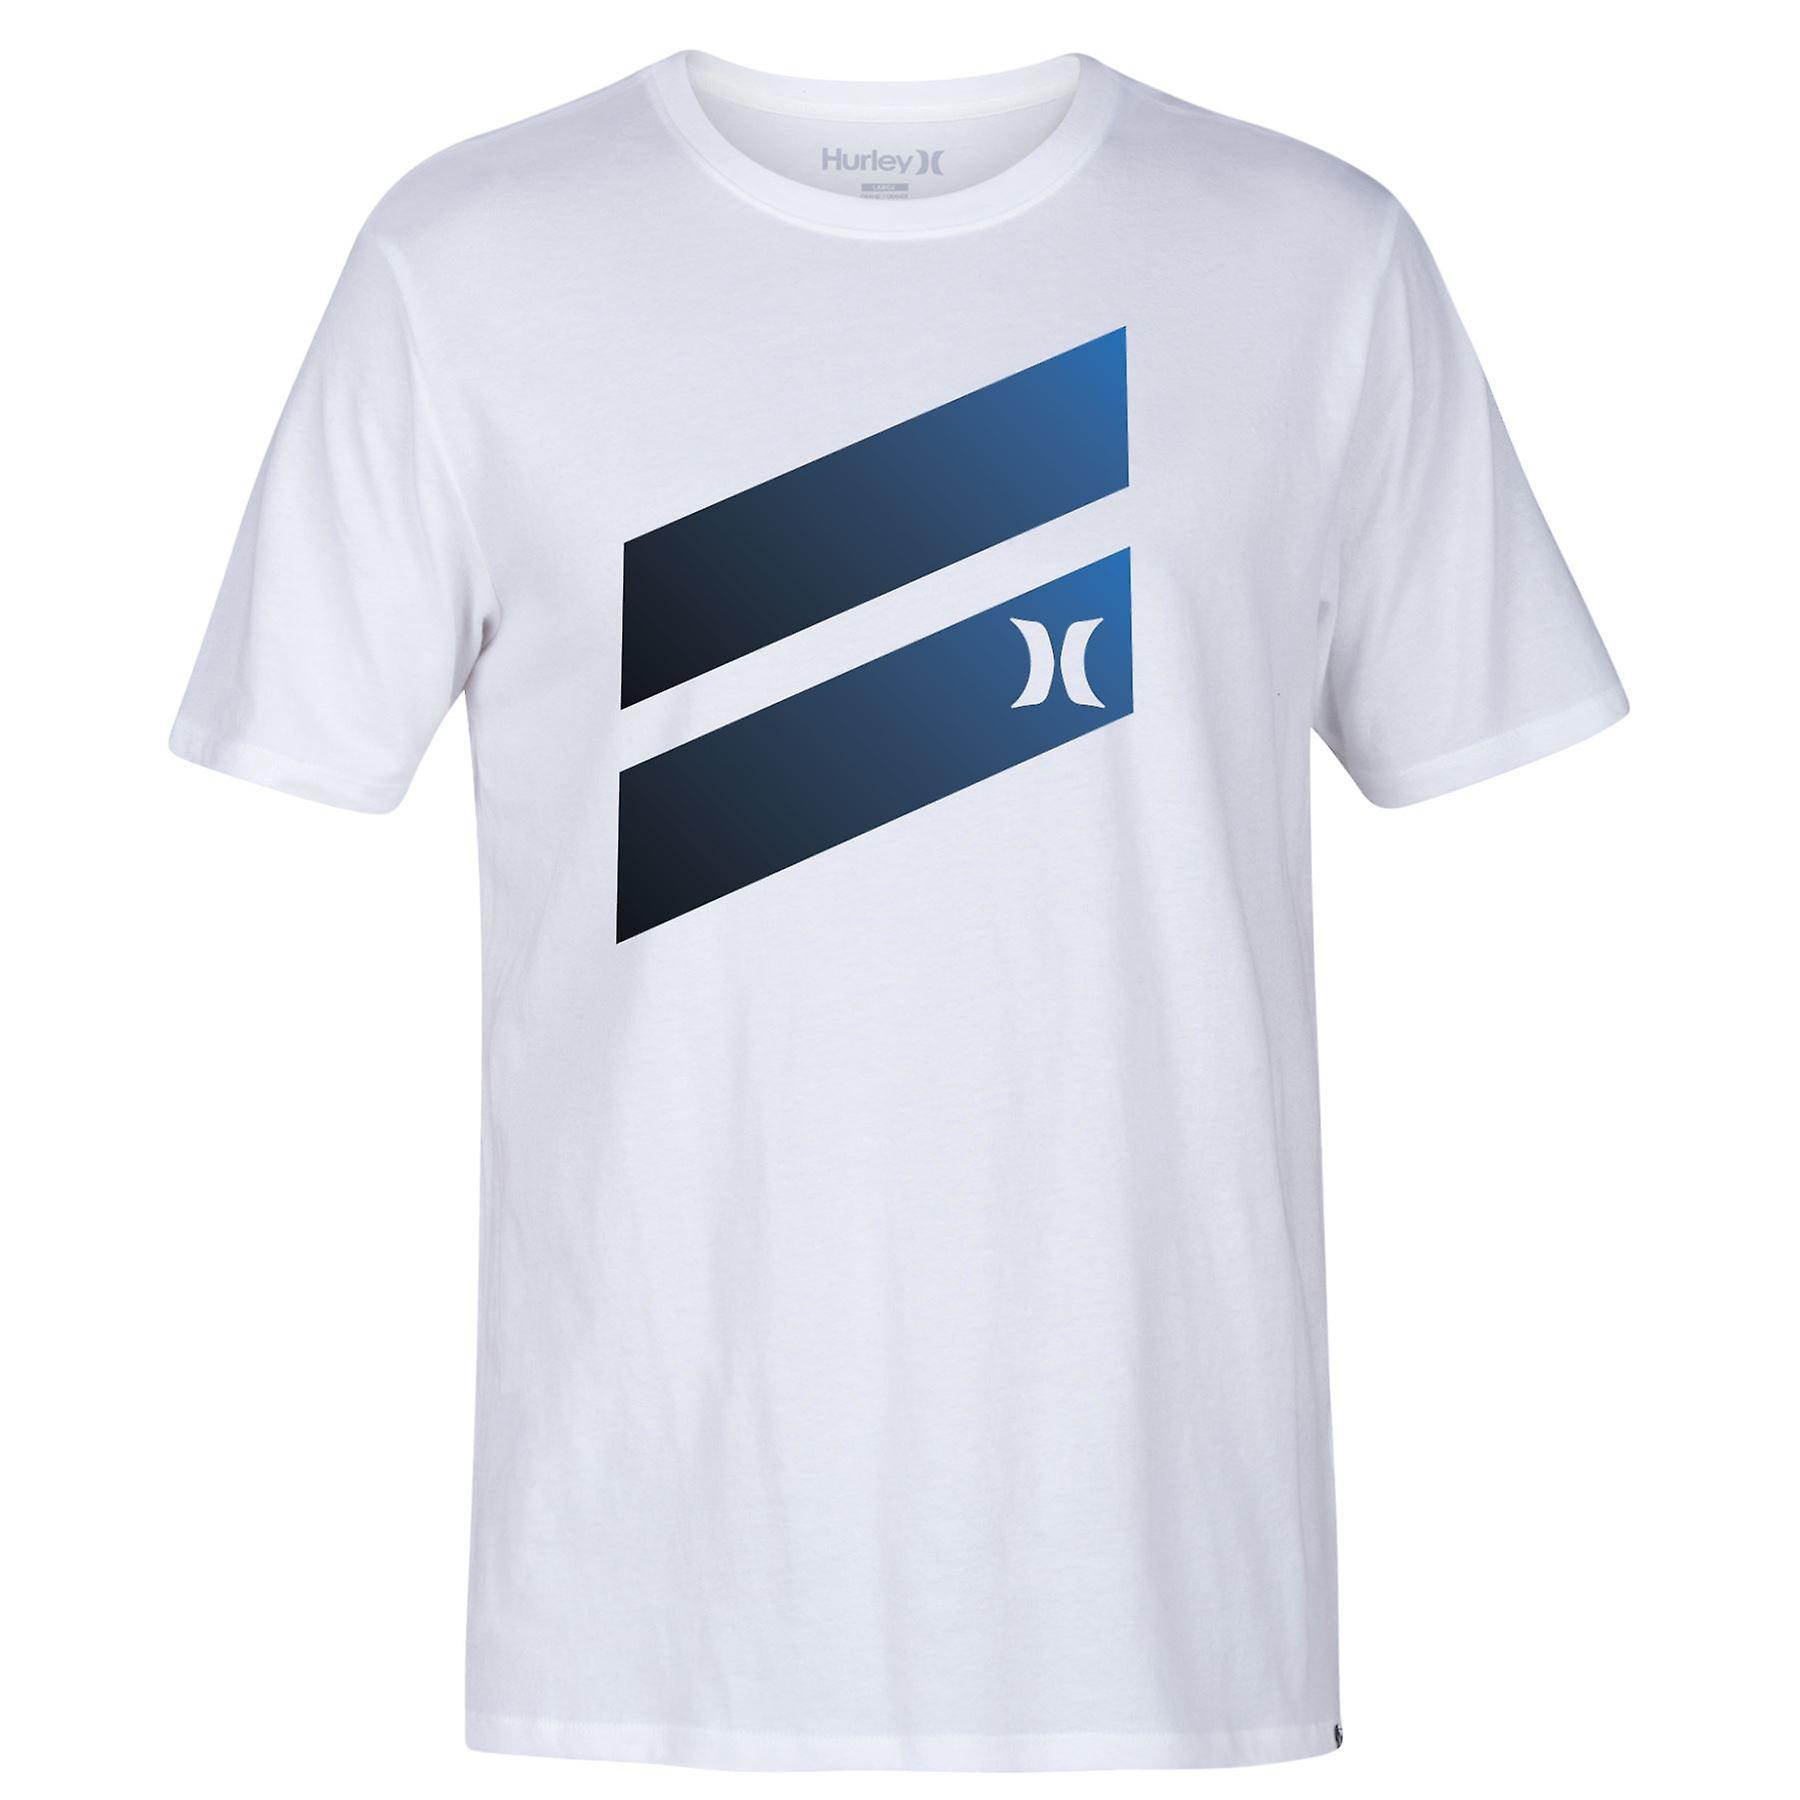 Hurley Men's T-Shirt ~ Icon Slash Gradient white